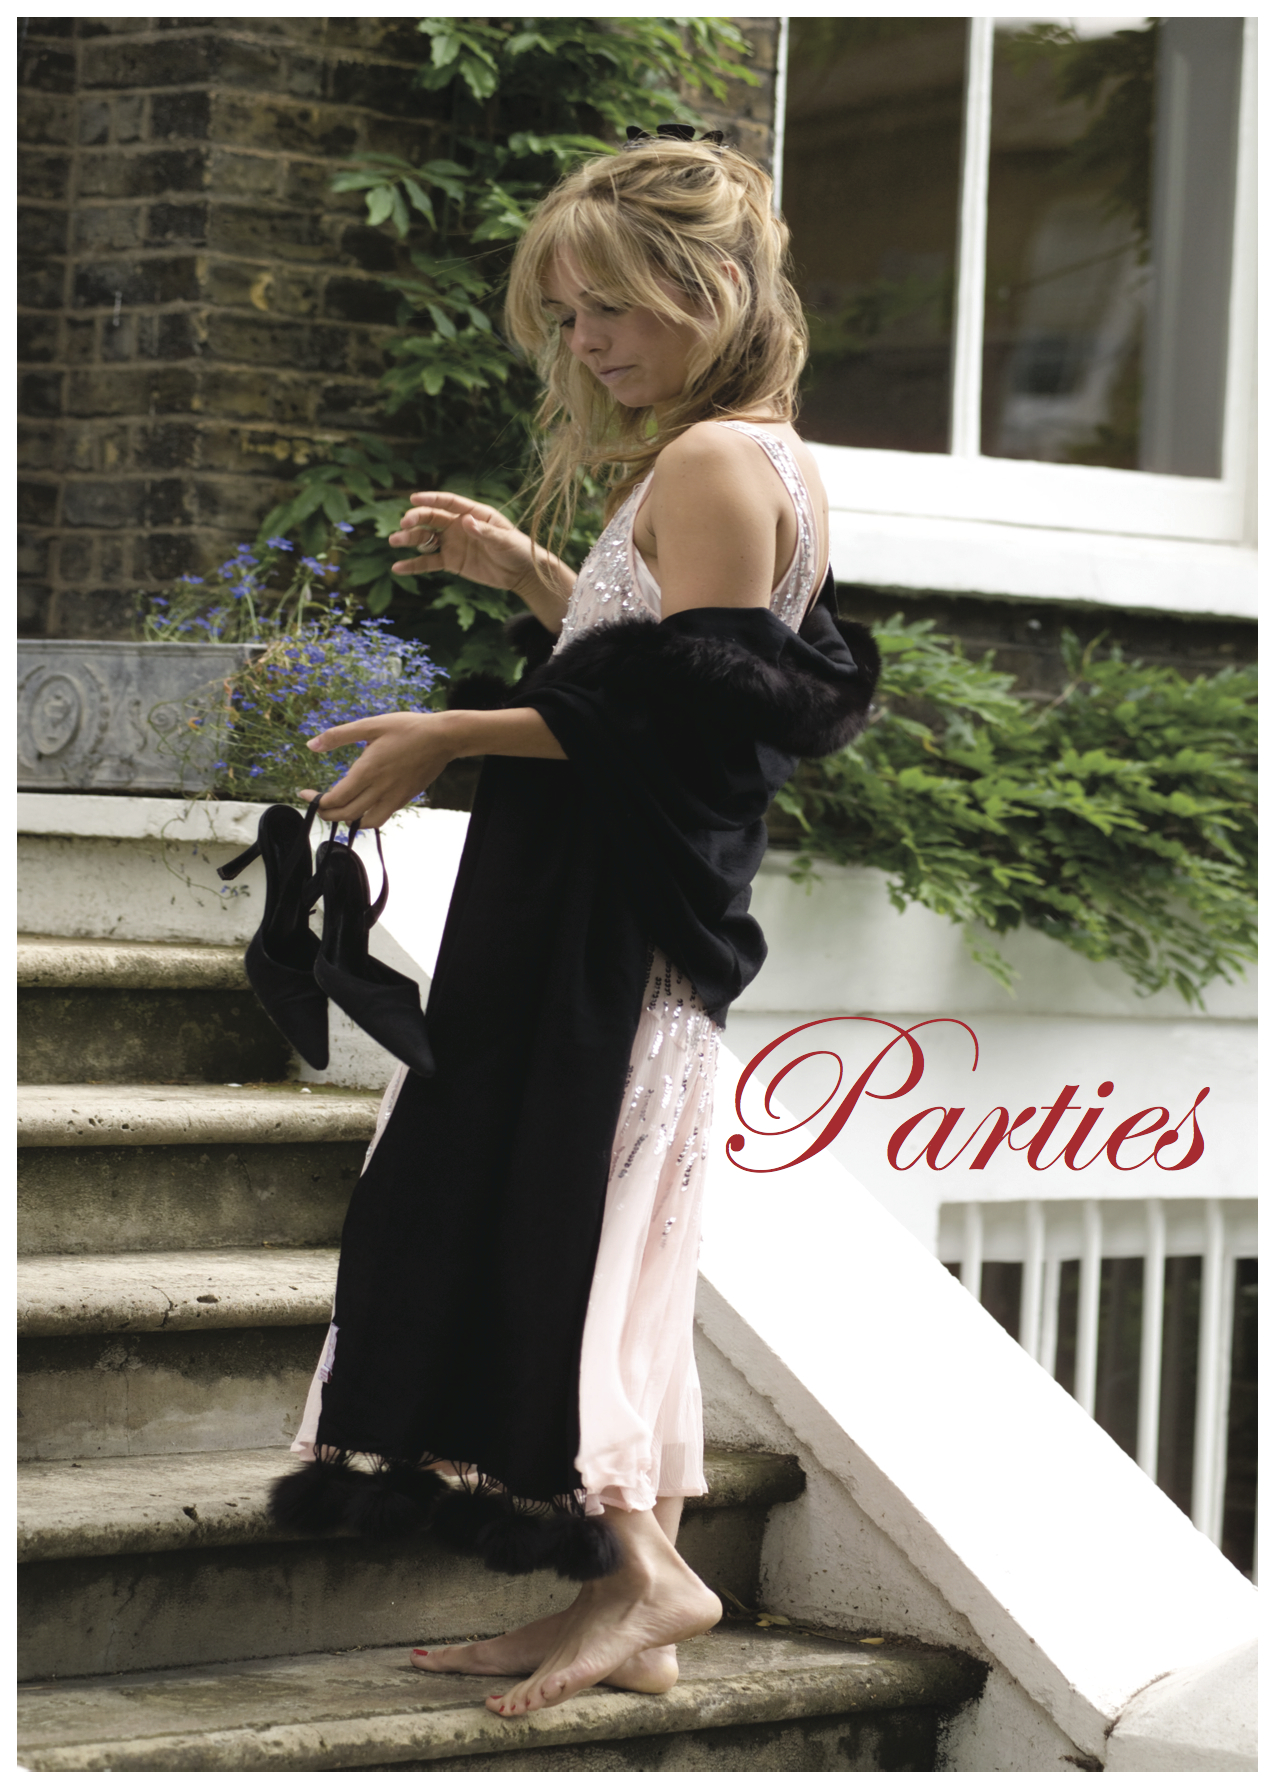 hl-parties